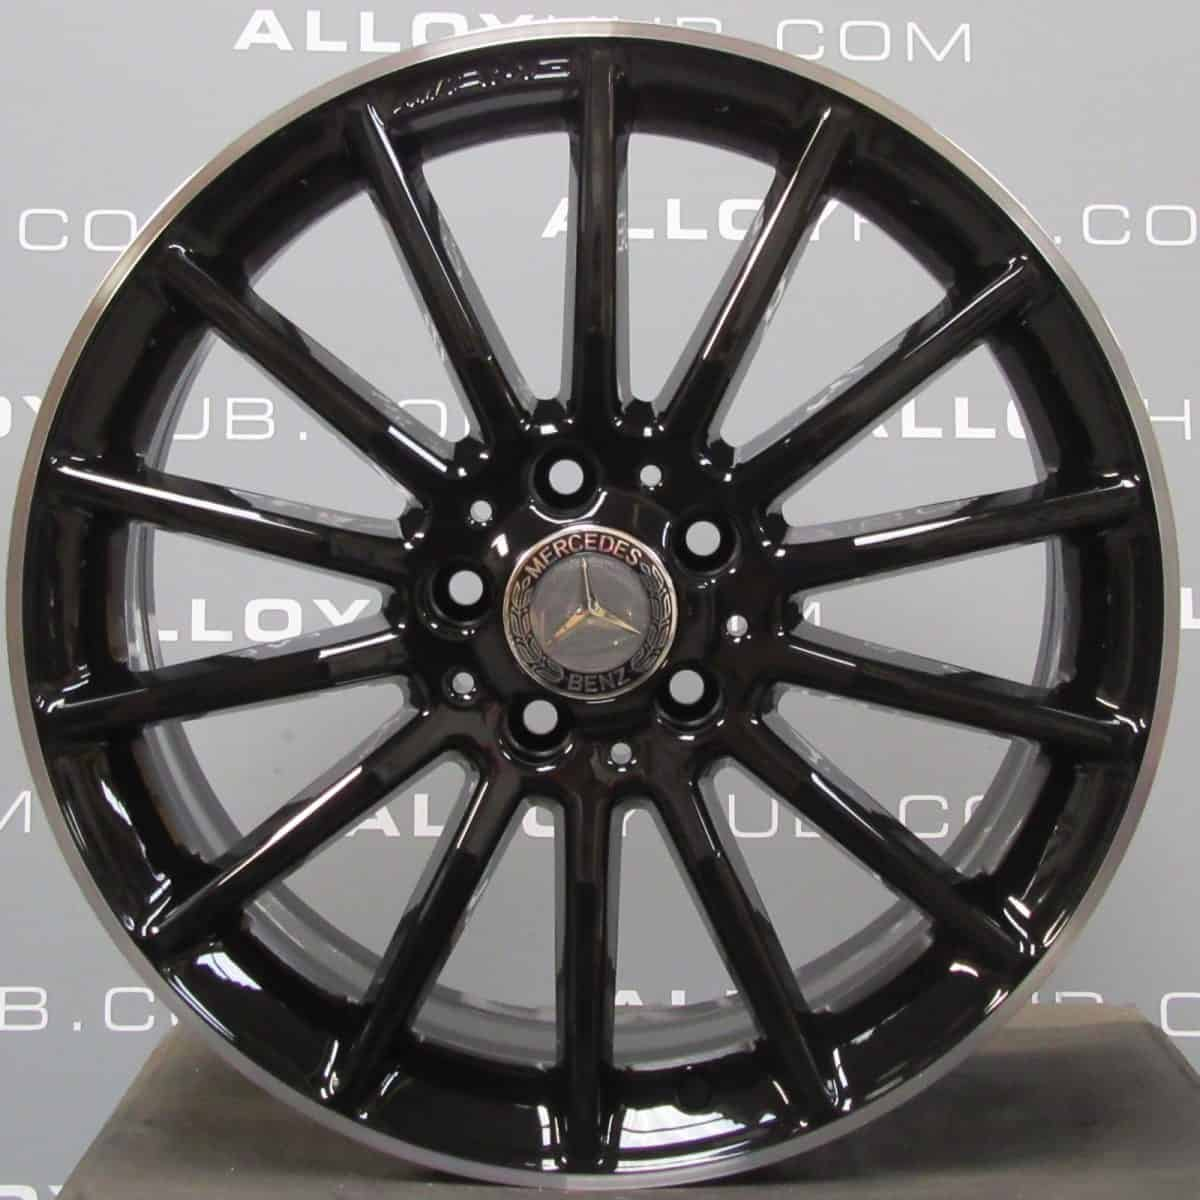 "Genuine Mercedes-Benz A/B Class W176 W246 18"" Inch AMG 16 Spoke Alloy Wheels with Gloss Black & Diamond Turned Finish A1764010200"